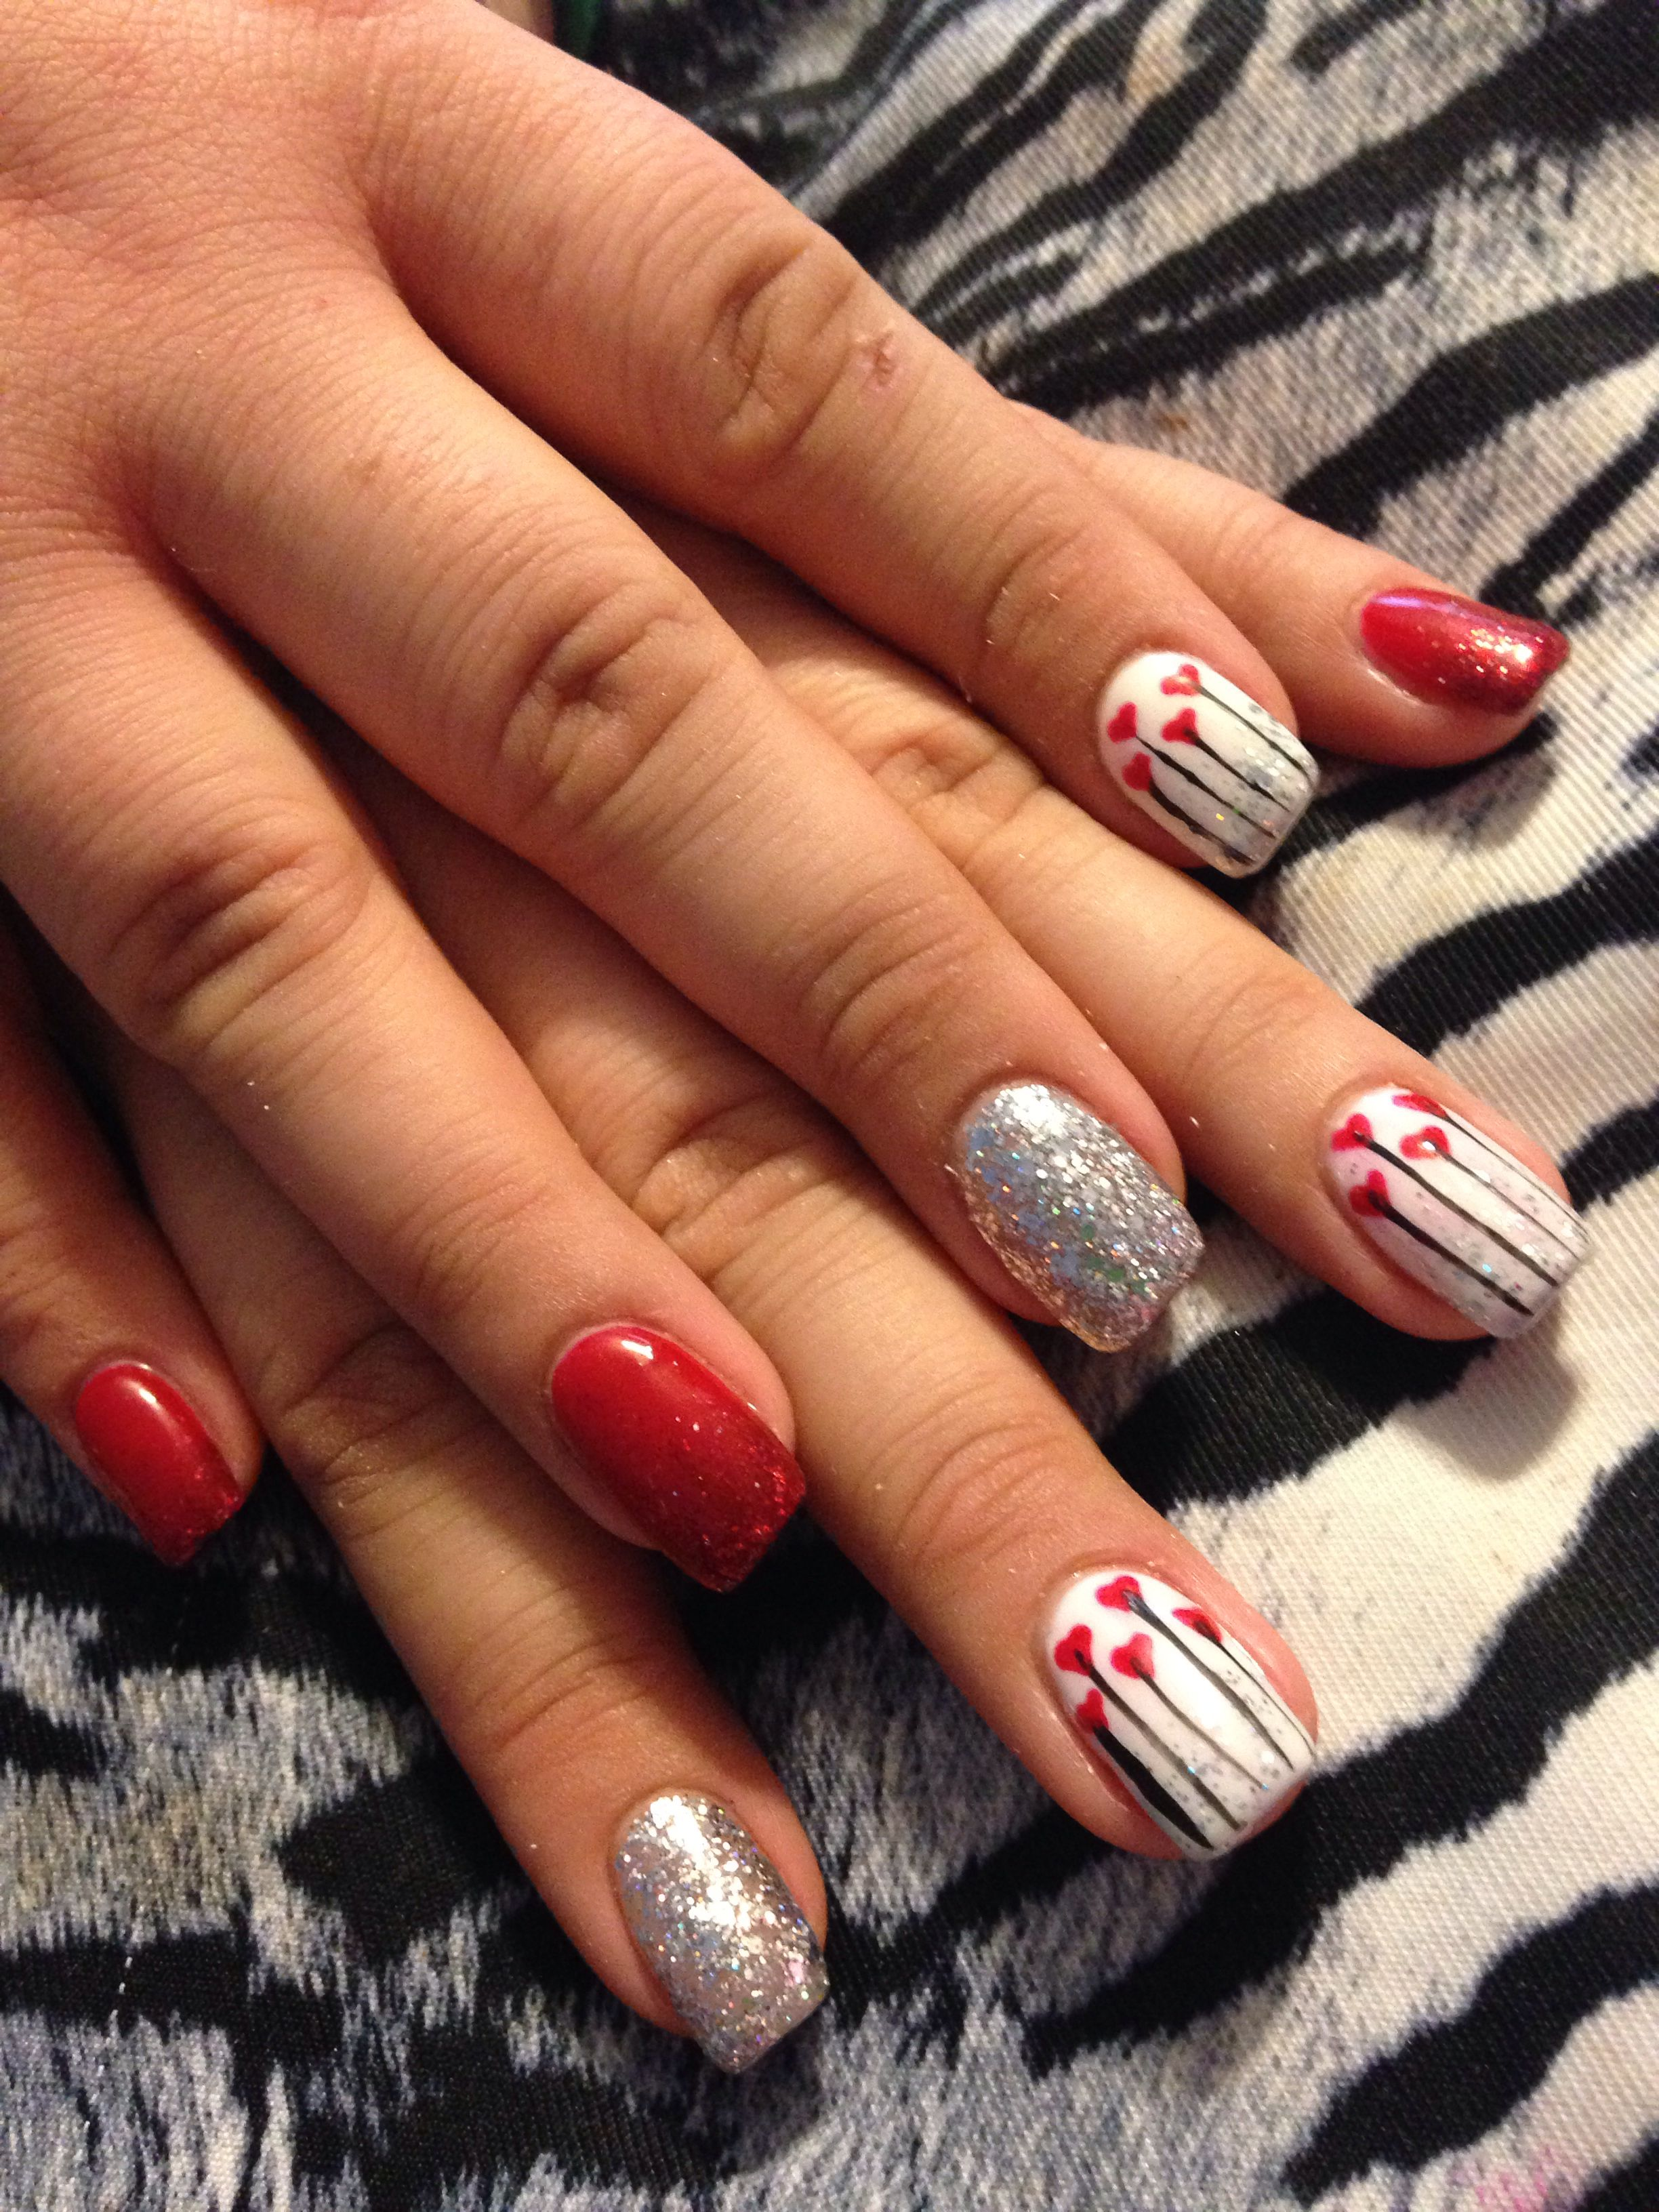 Acrylic nail design valentine's day | Sara's nail designs ...